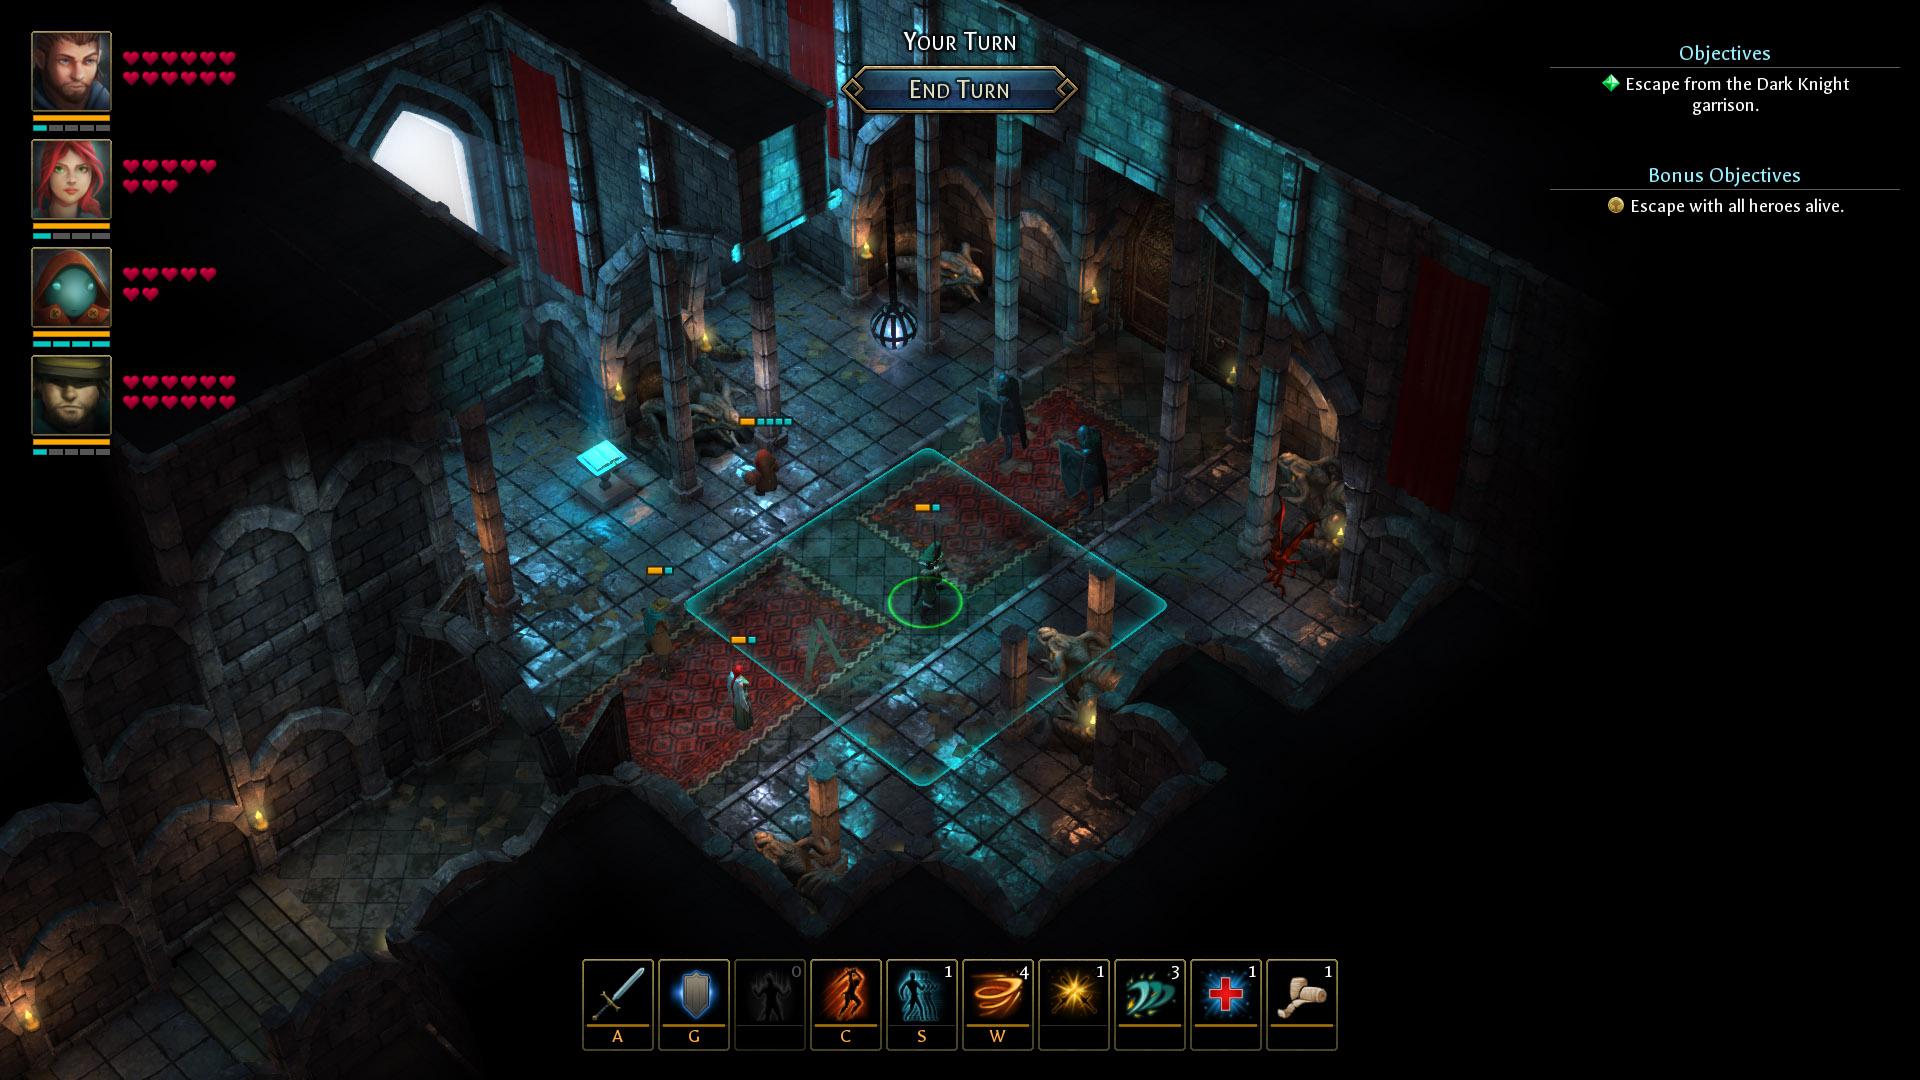 Agora encomendas ao vivo para o CRPG tático Druidstone: Os segredos do ...